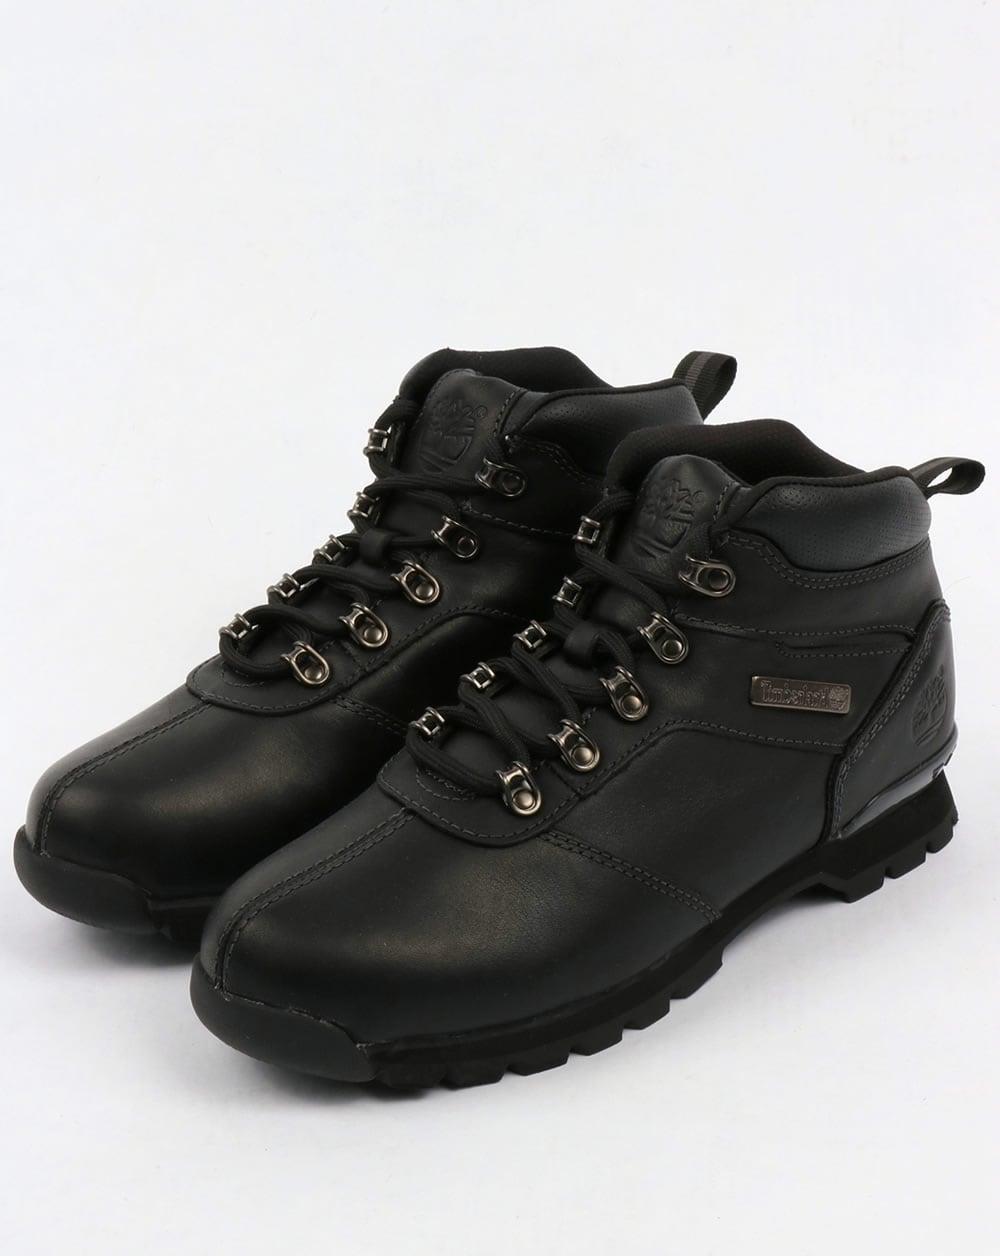 Timberland Splitrock Ii Boots Black 2 Pro Shoes Hiker Mens